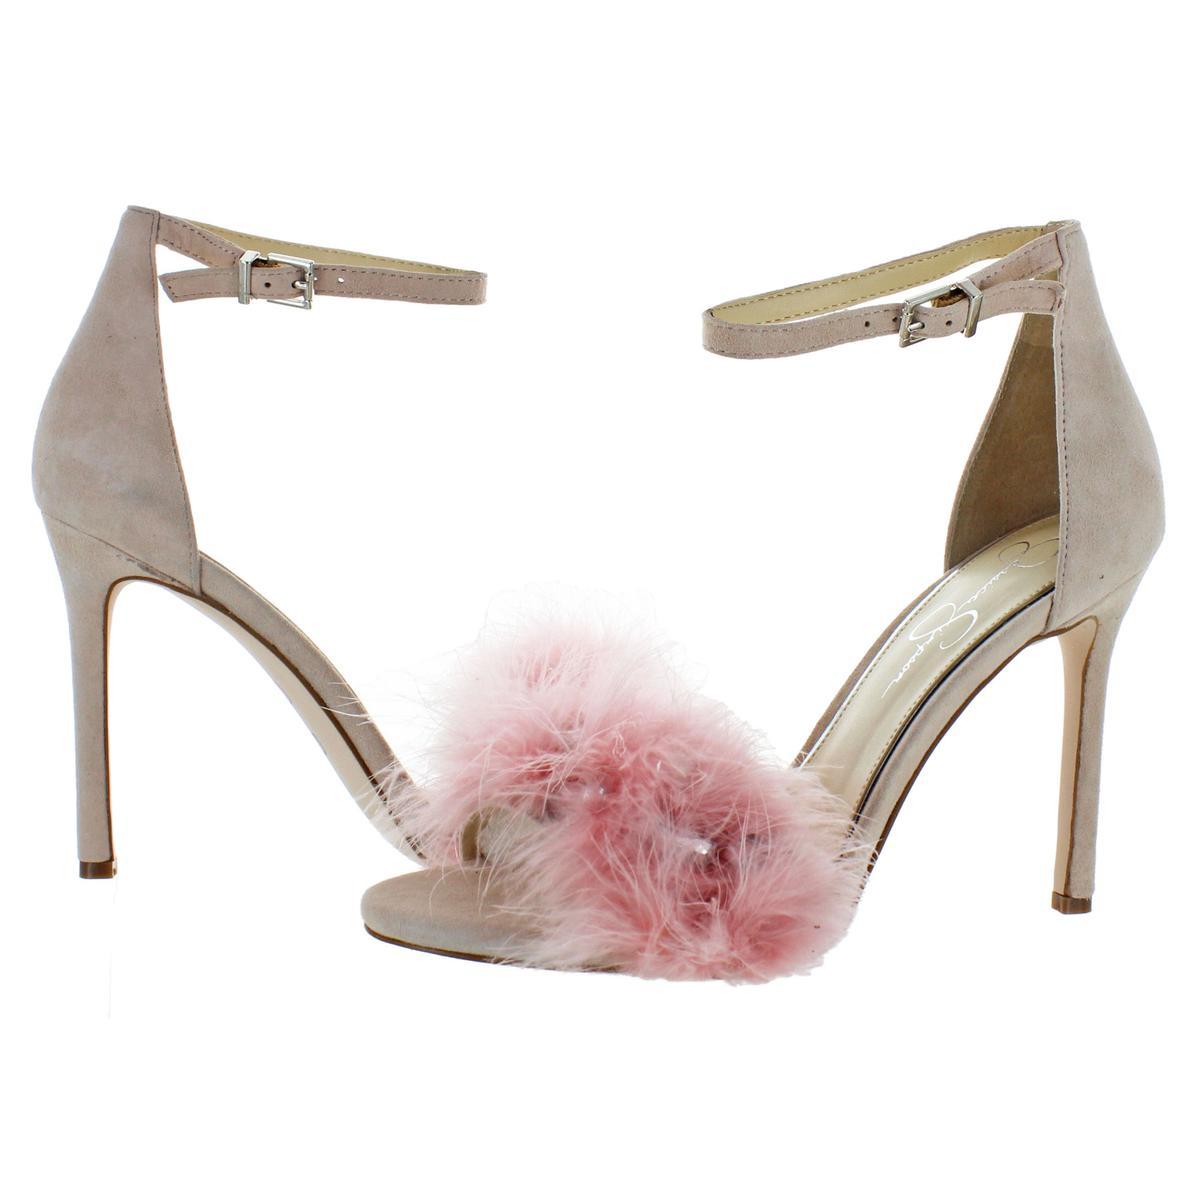 Jessica-Simpson-Womens-Jolinda-Suede-Feather-Dress-Sandals-Shoes-BHFO-8609 thumbnail 5